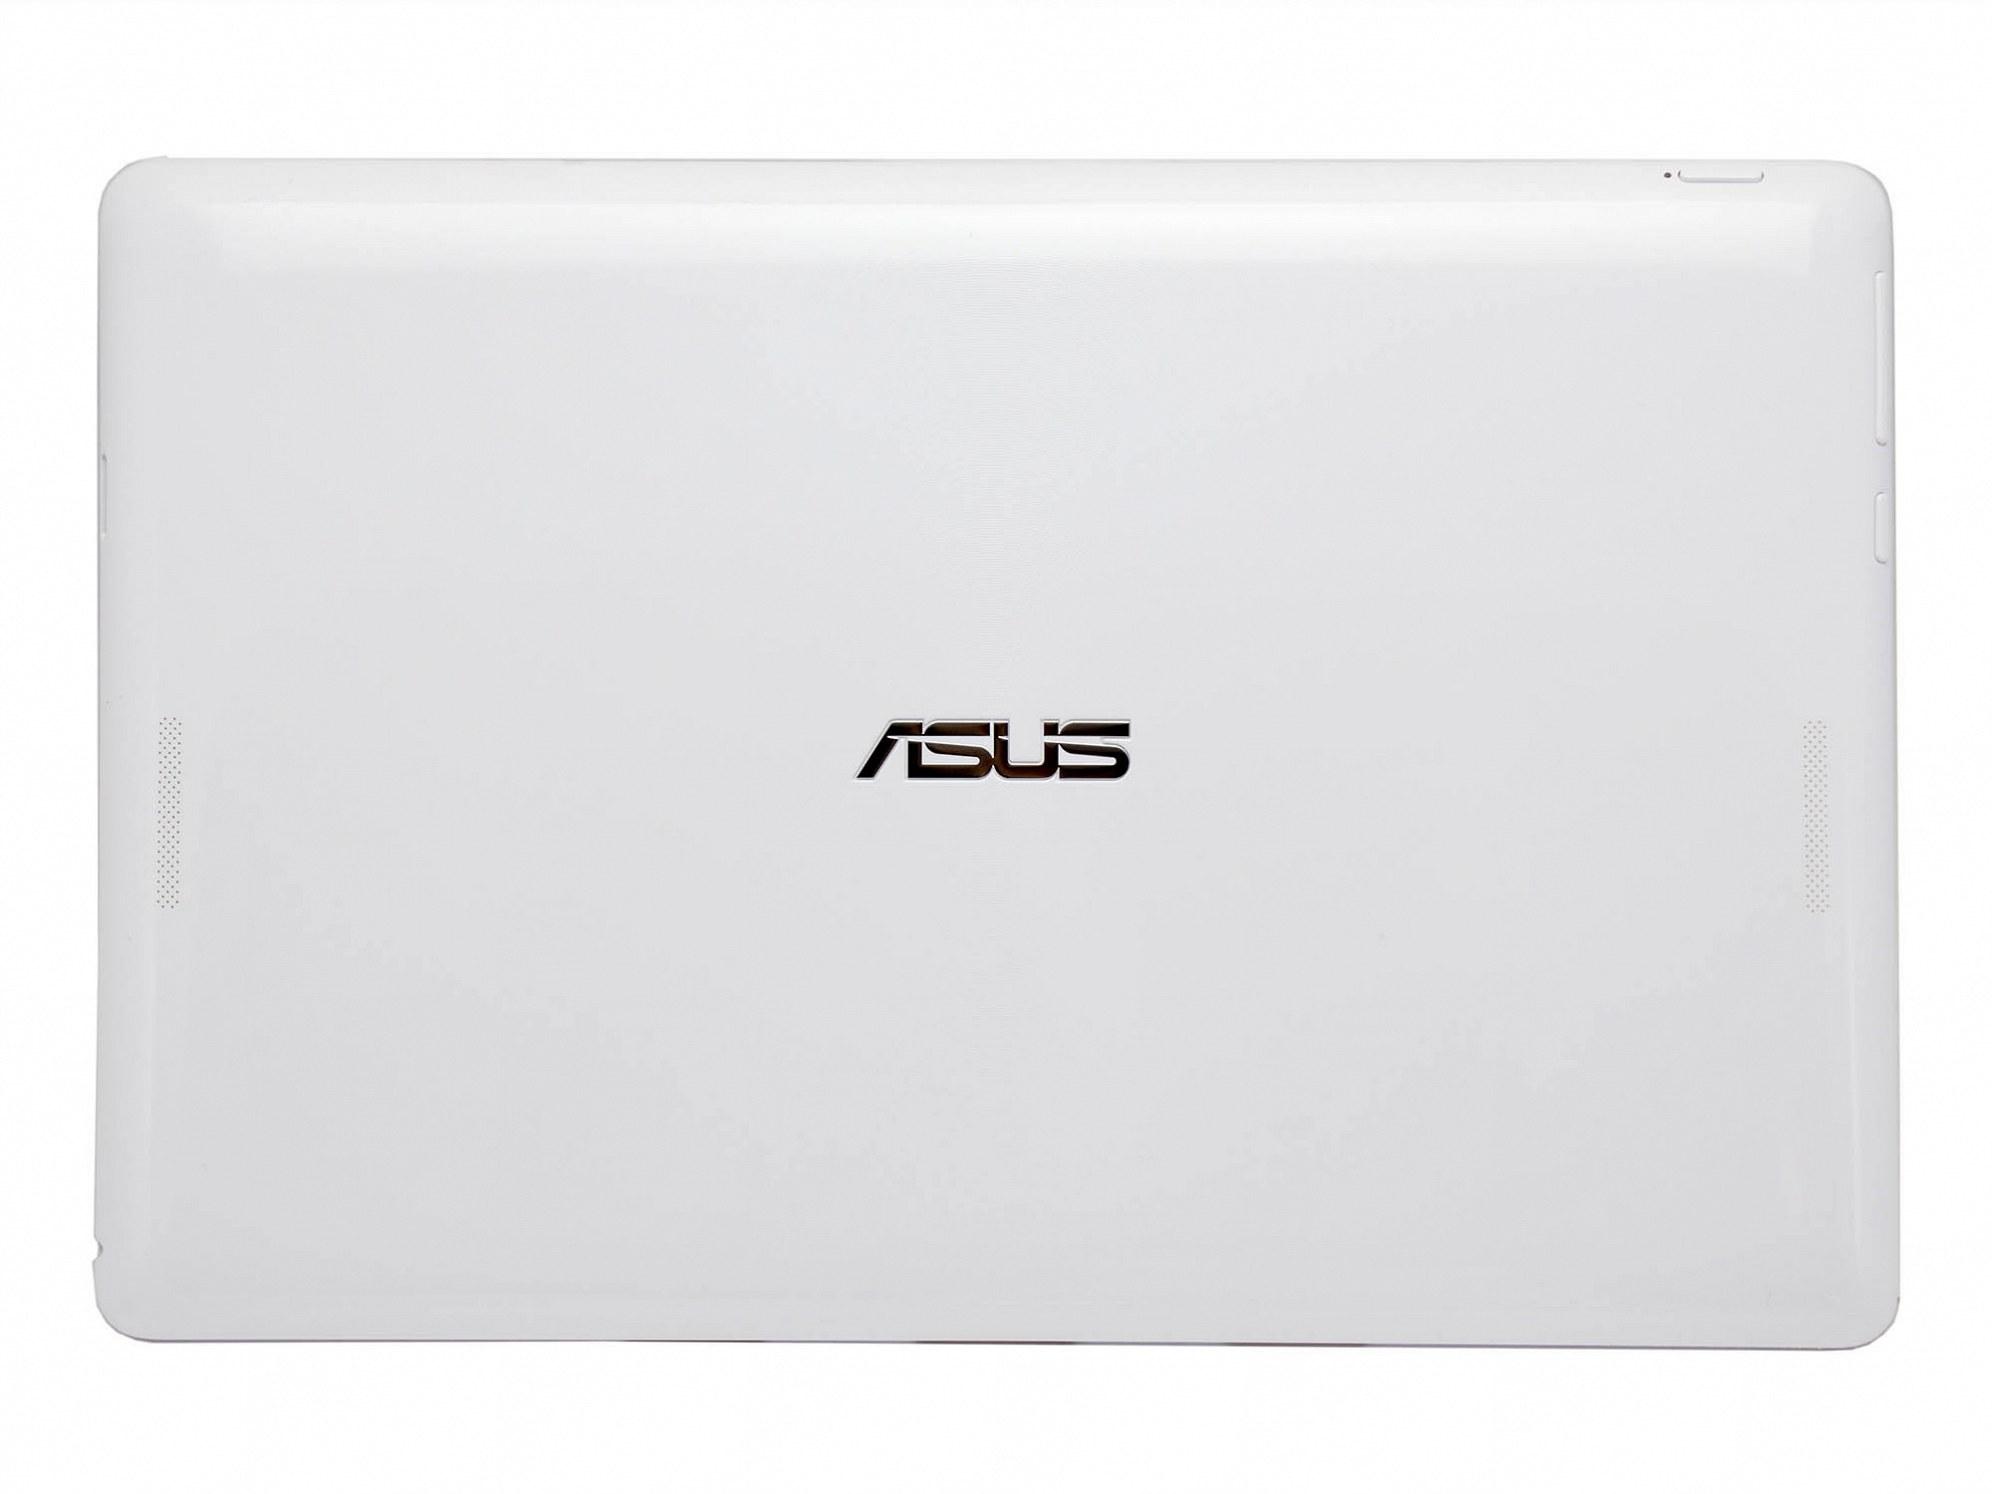 Asus 90NB0452-R7A010 Batterieabdeckung weiß Original